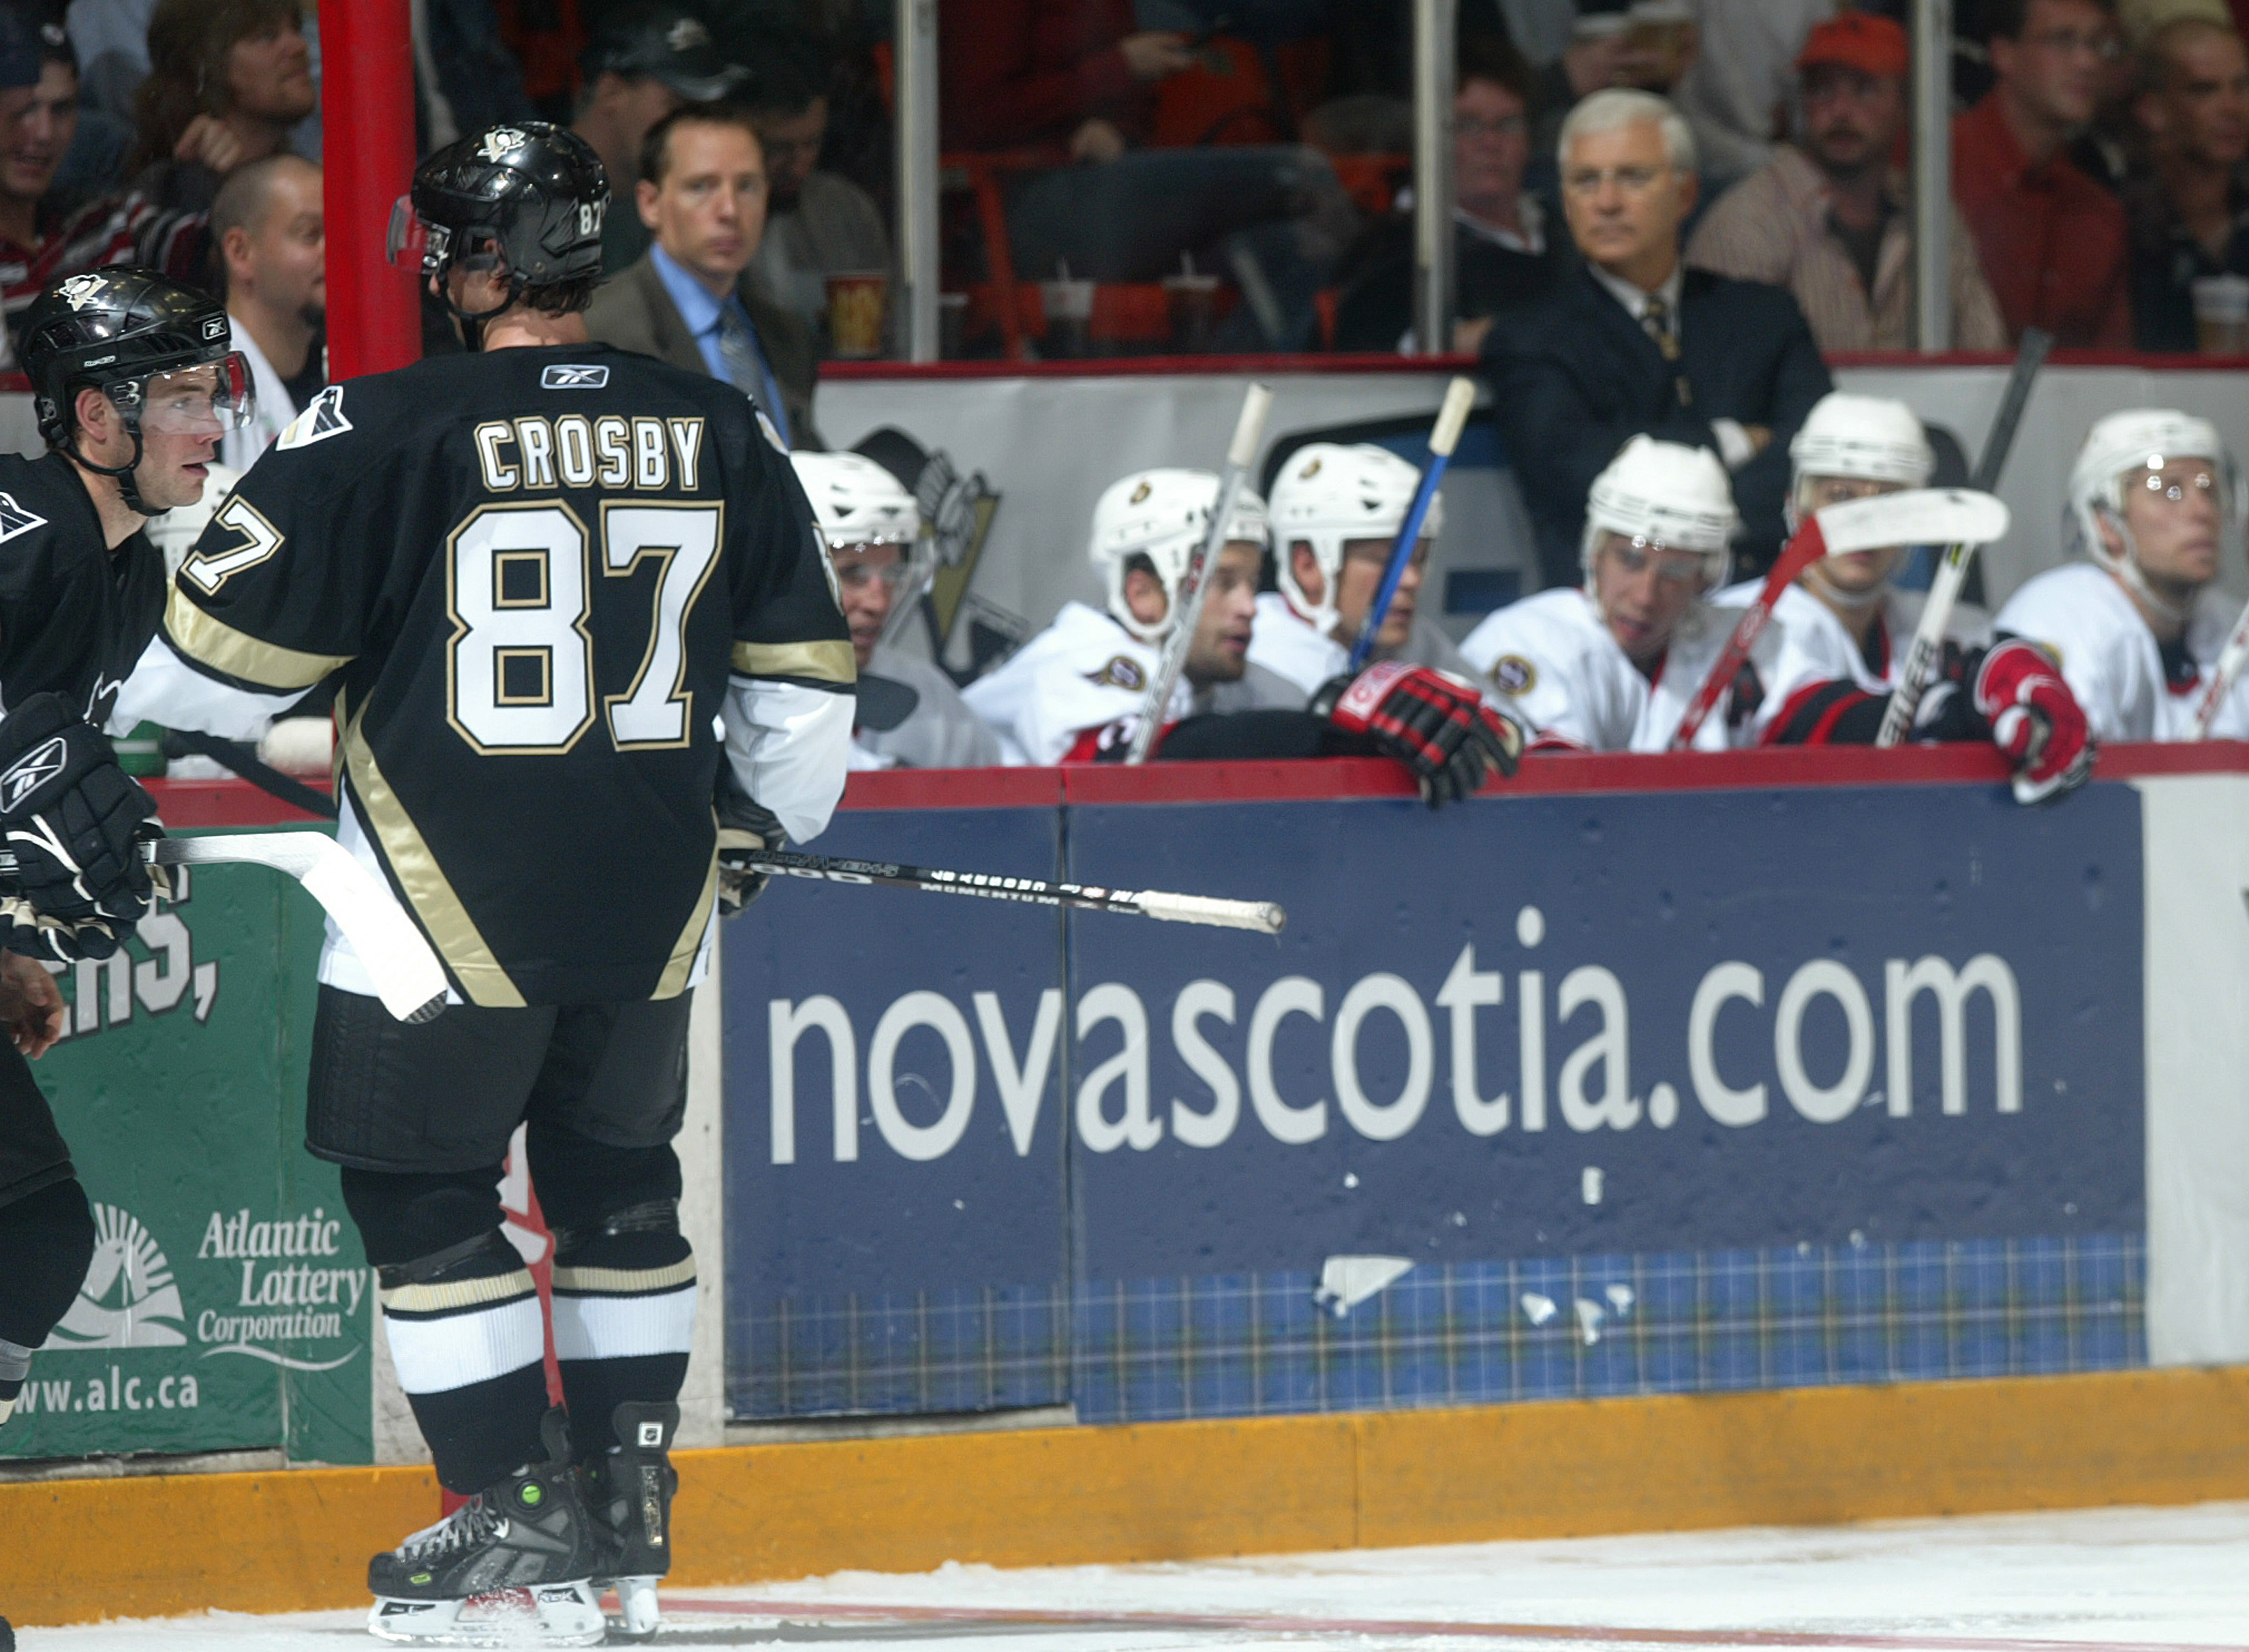 Crosby1